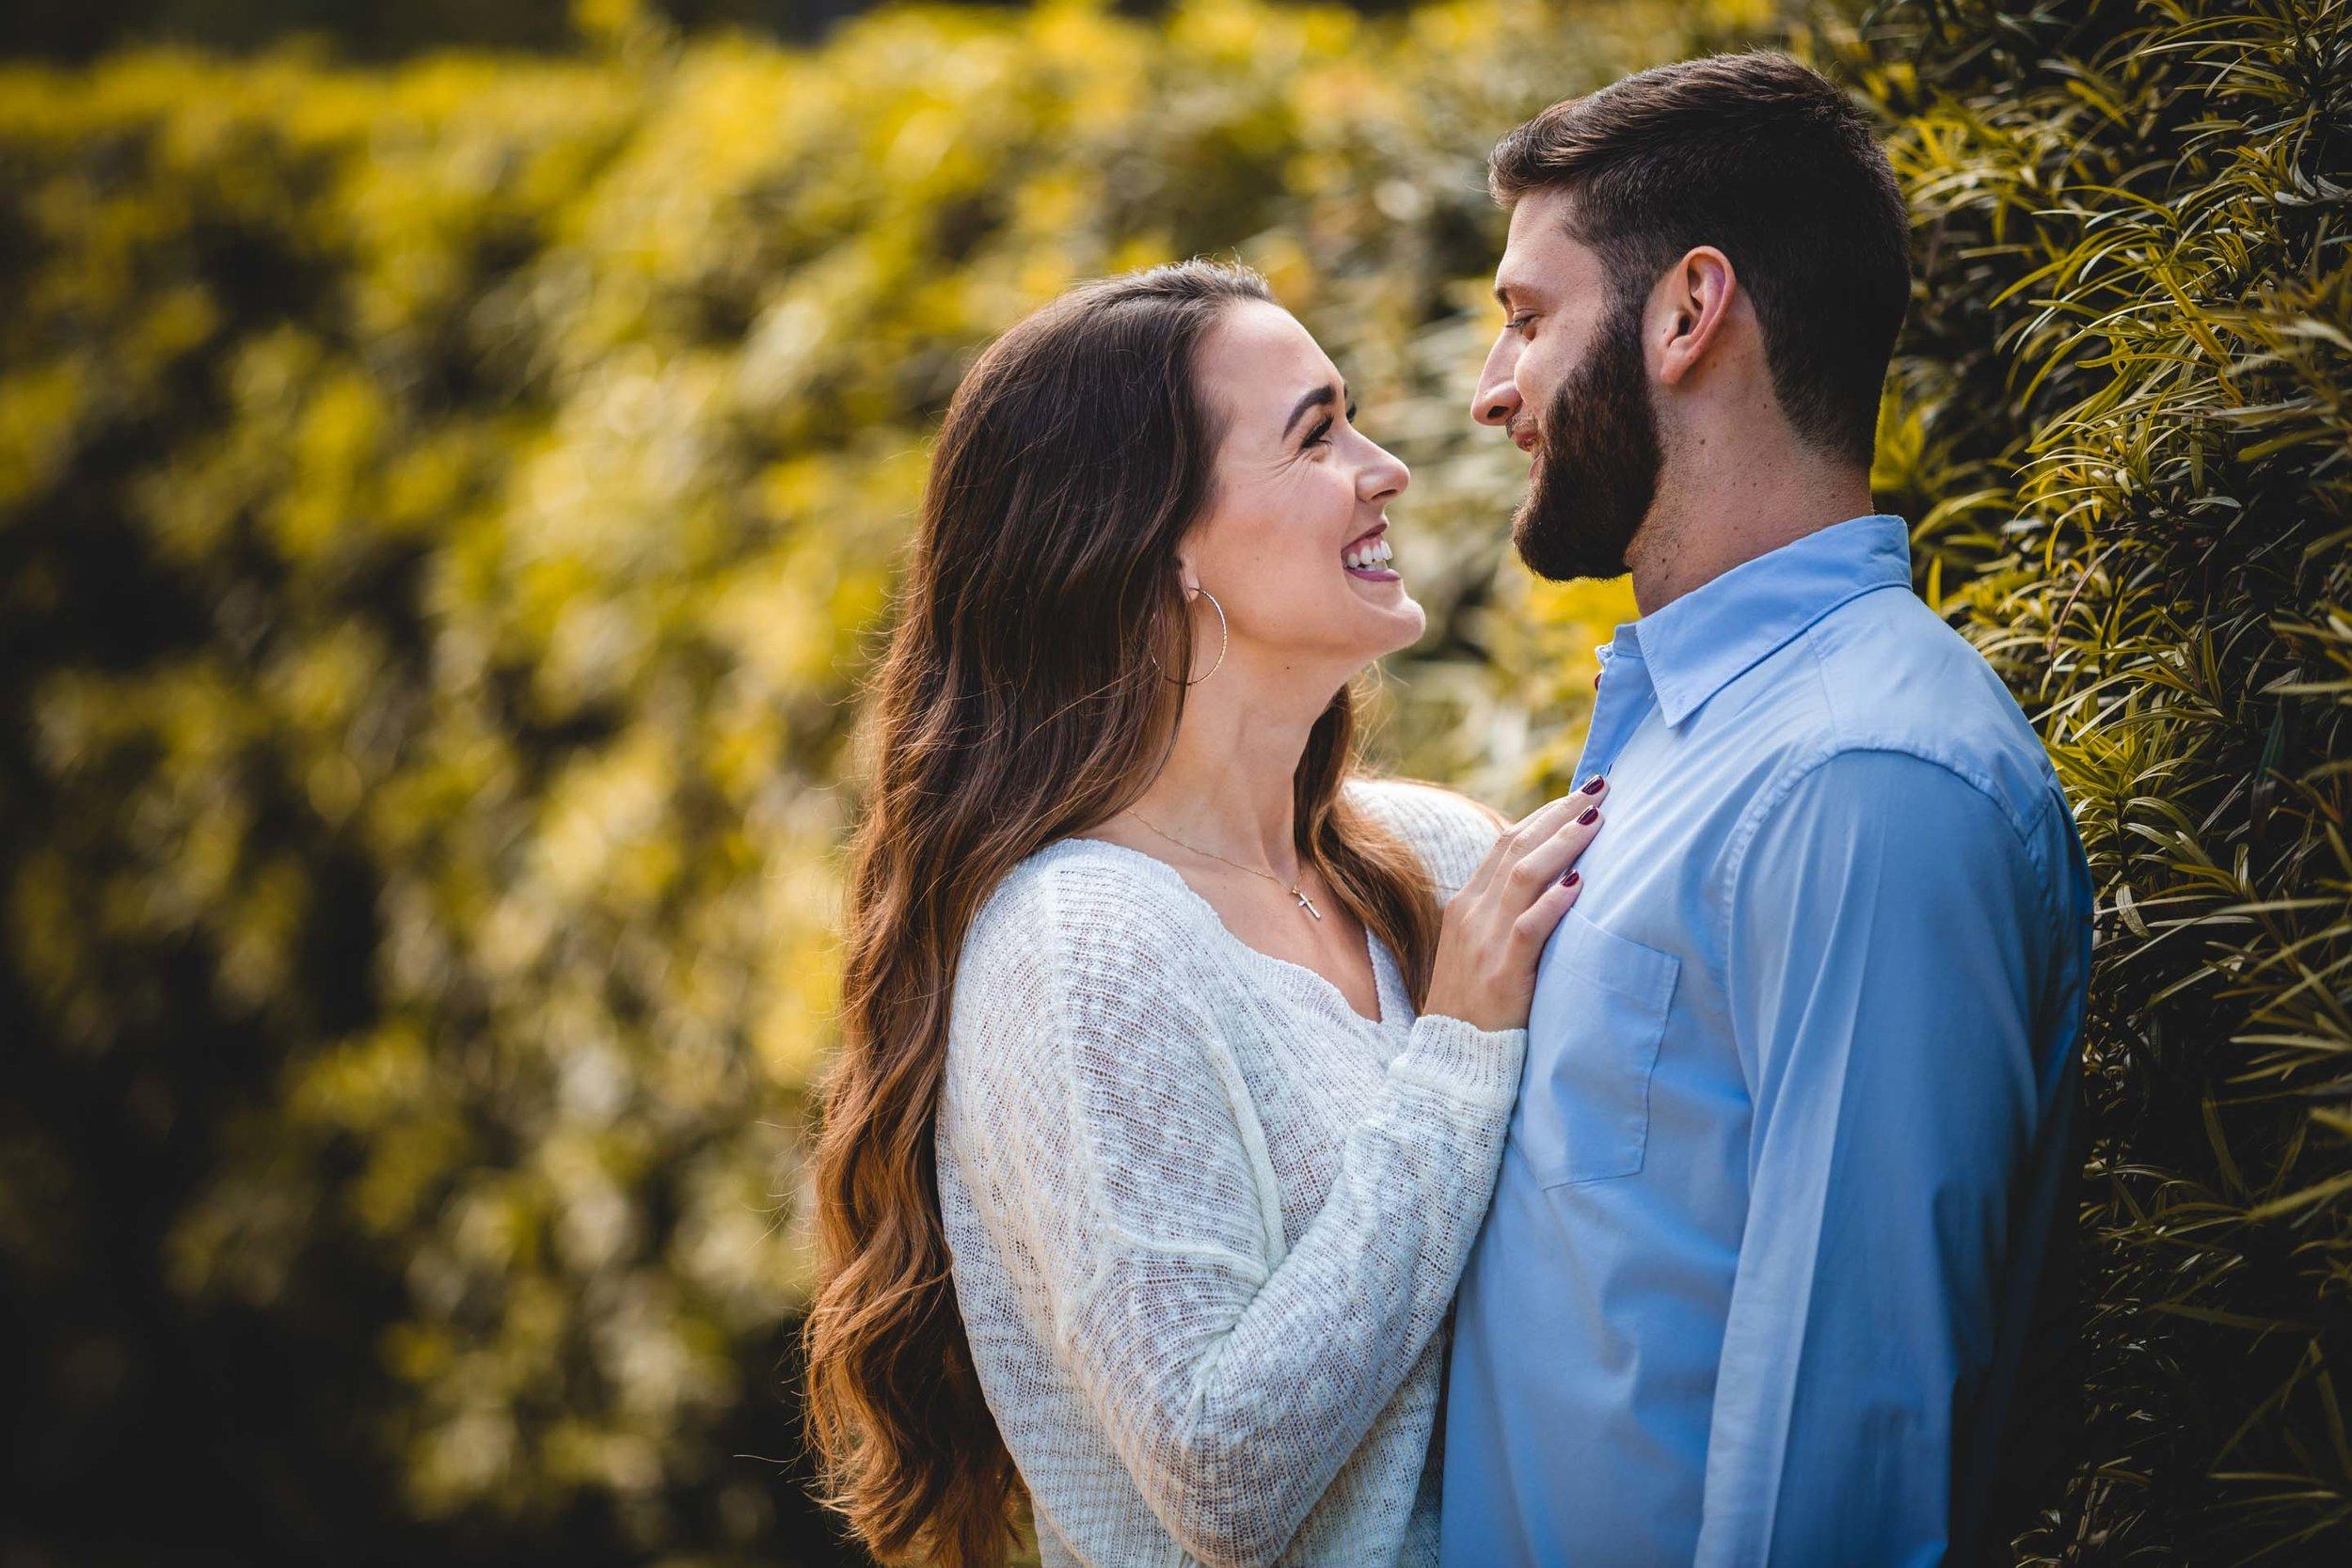 adam-szarmack-jacksonville-wedding-photographer-palm-coast-washing-oaks-garden-state-park-engagement-9.jpg